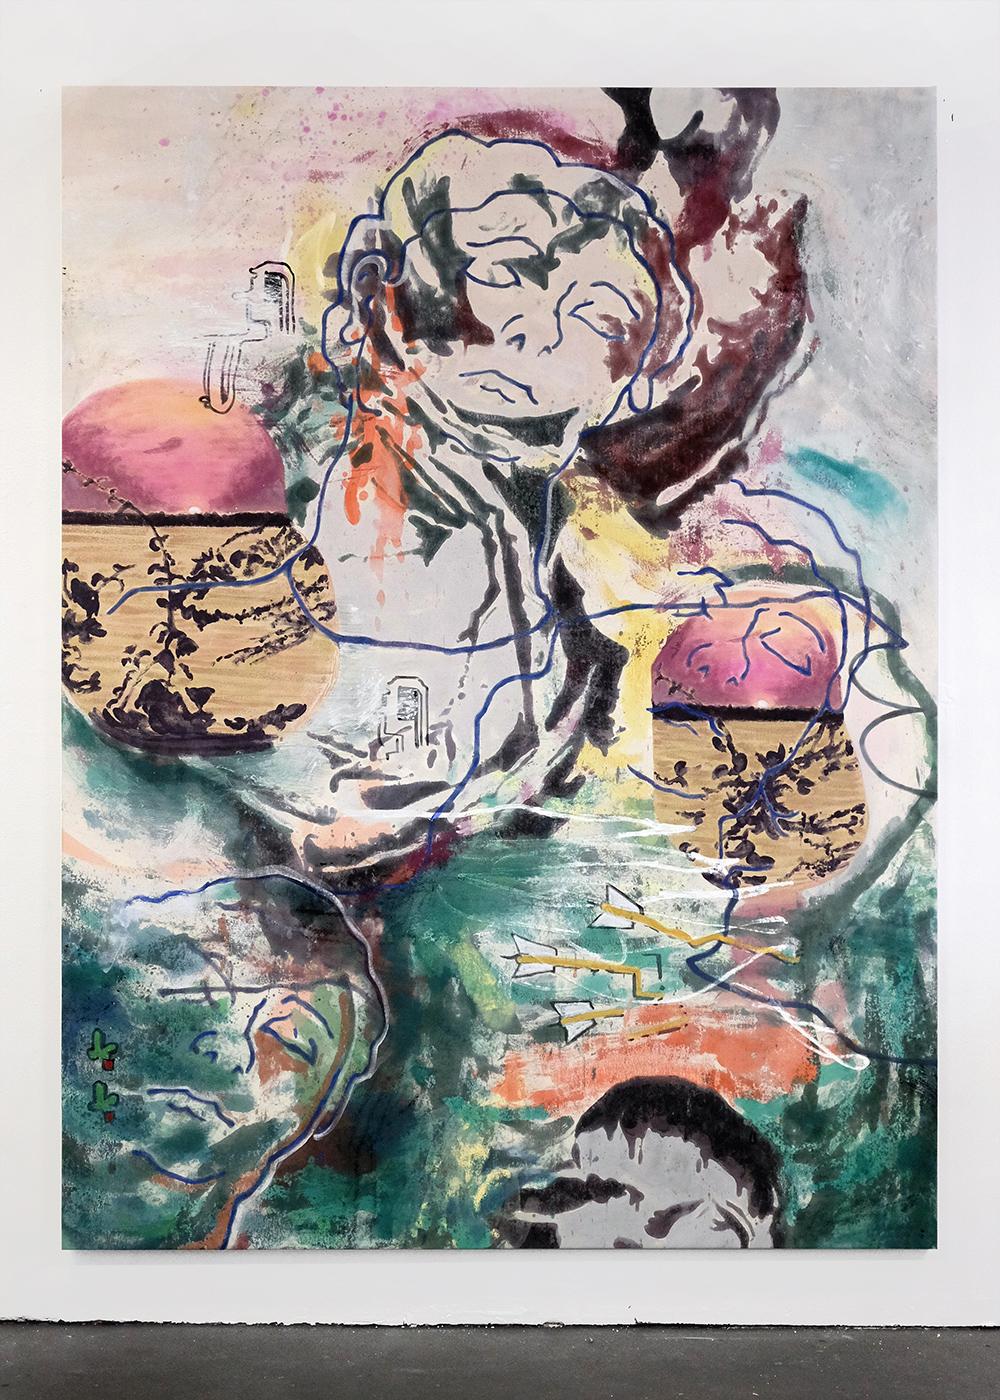 Chris Hood,  Vita Sueno , 2018, Alkyd on canvas, 91 x 70 inches